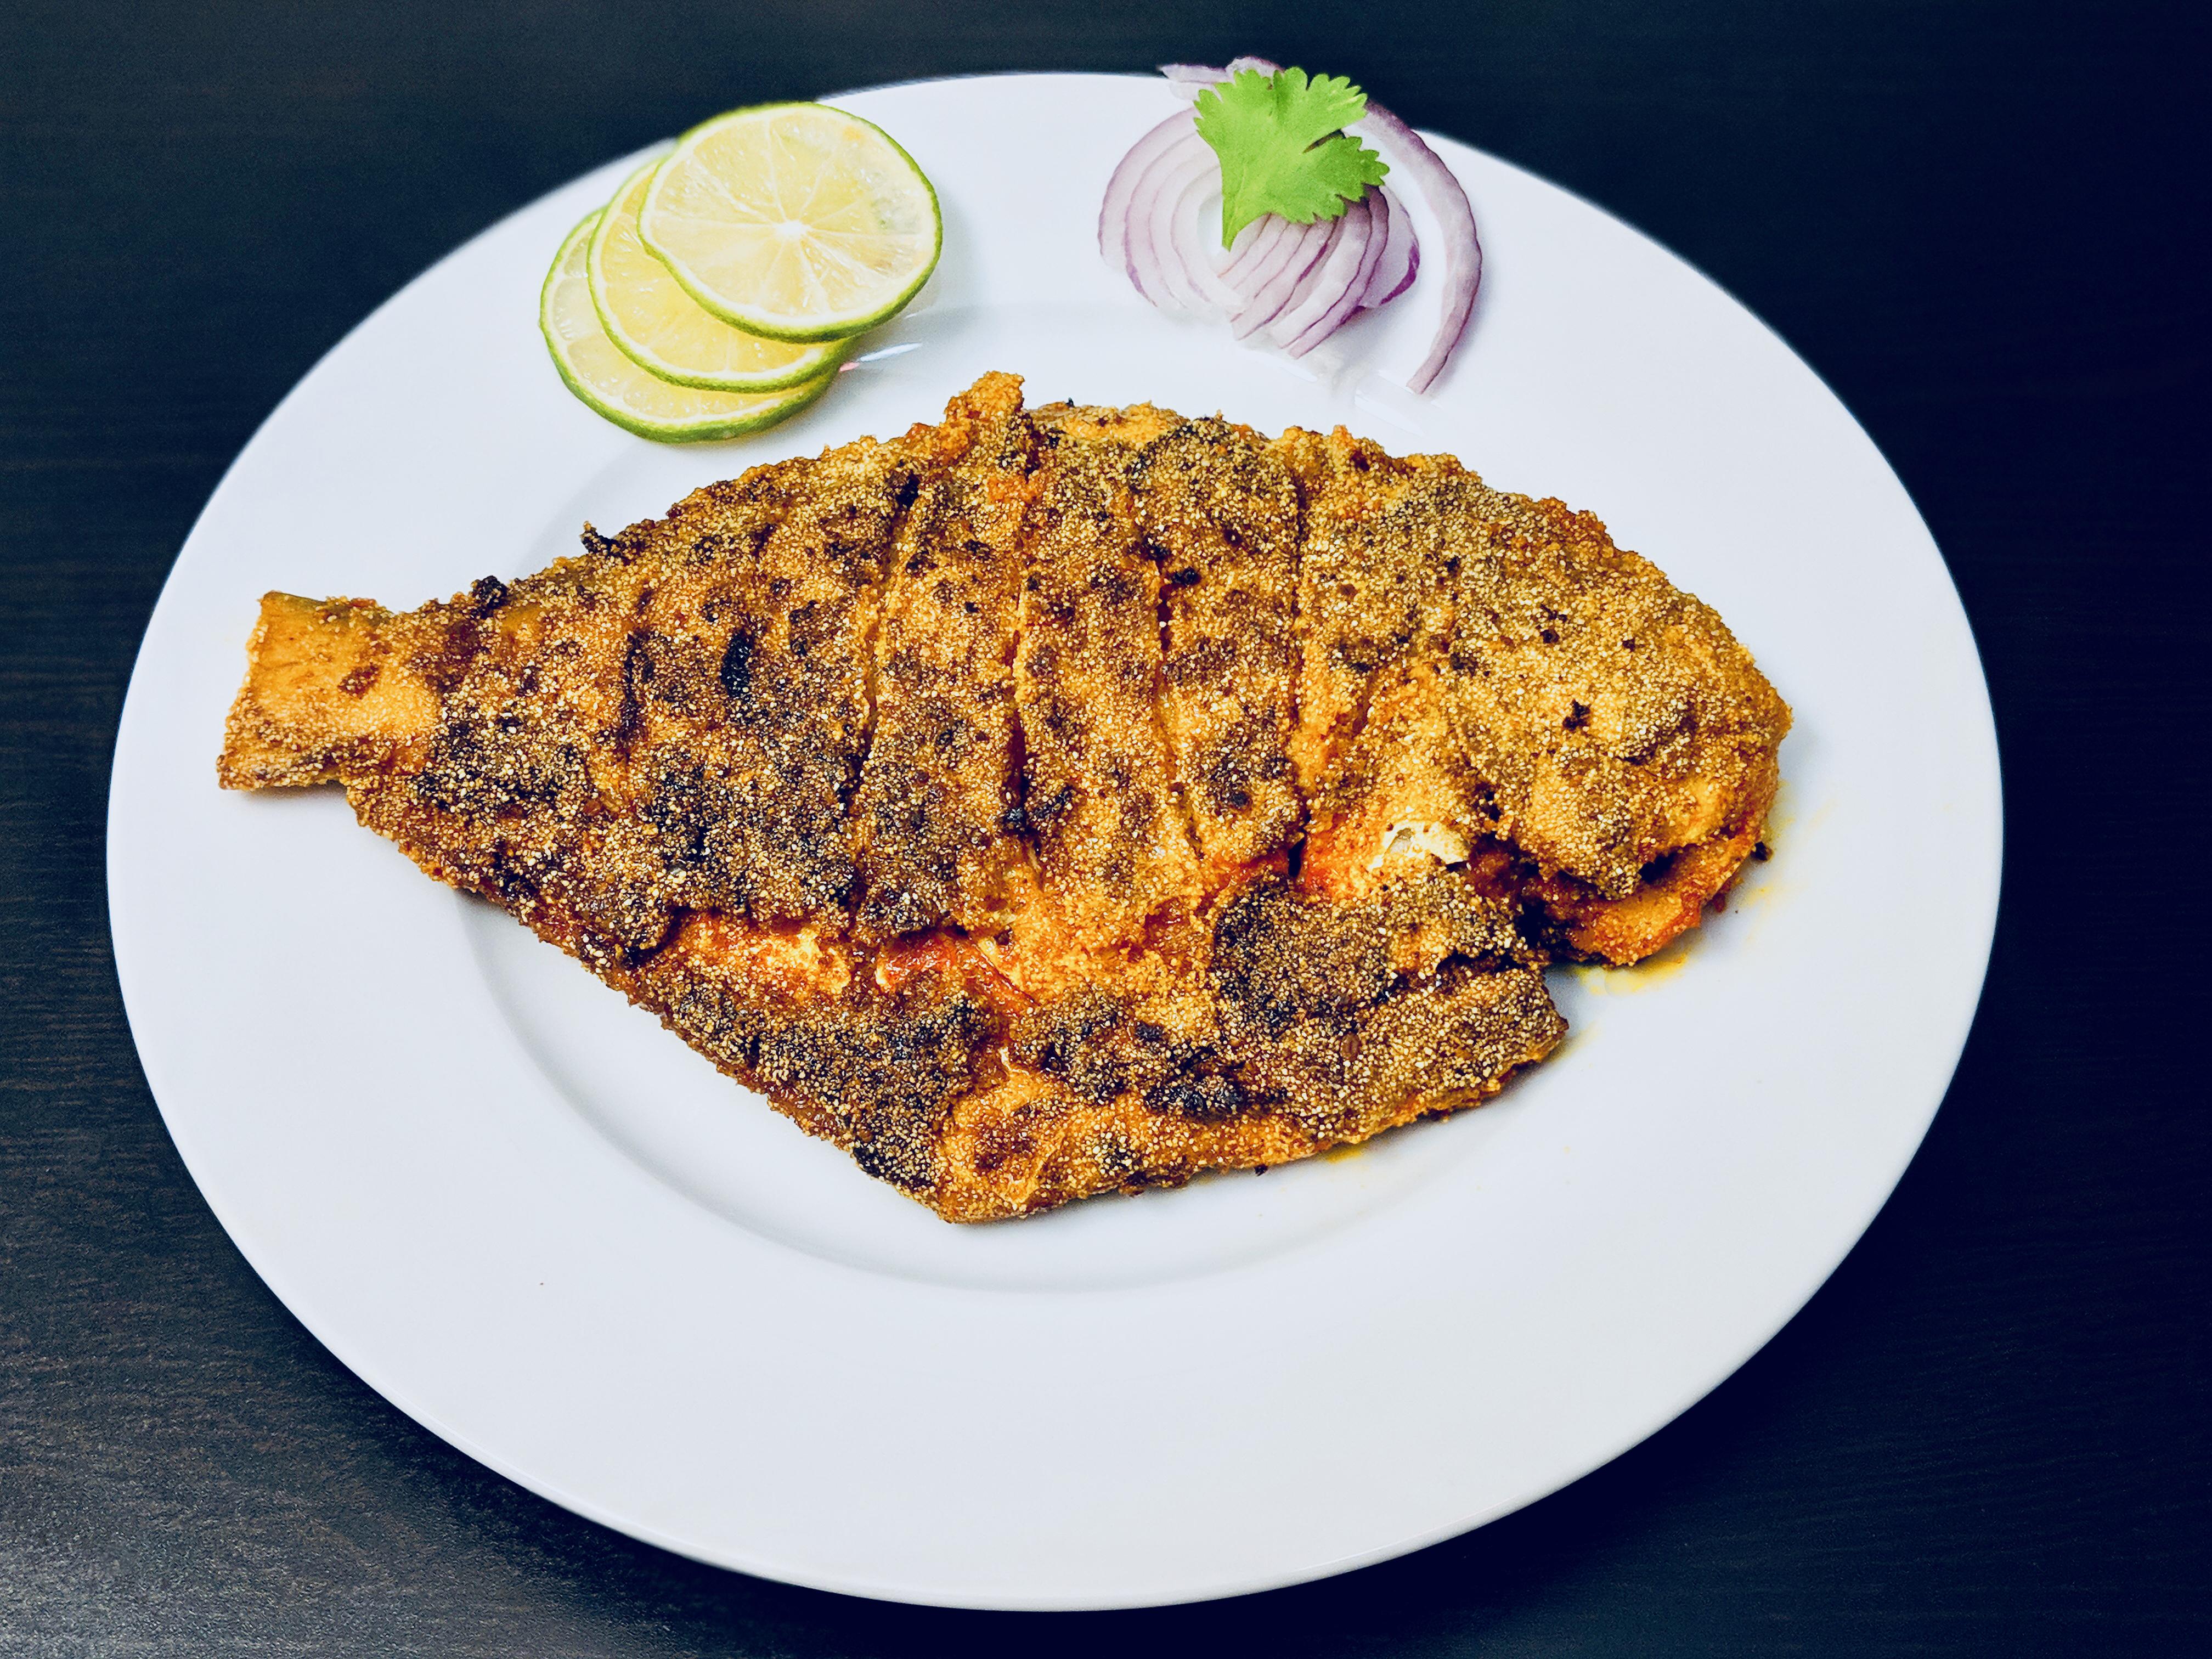 Homemade Rawa Semolina Fish Fry Food Fried Fish Fried Food